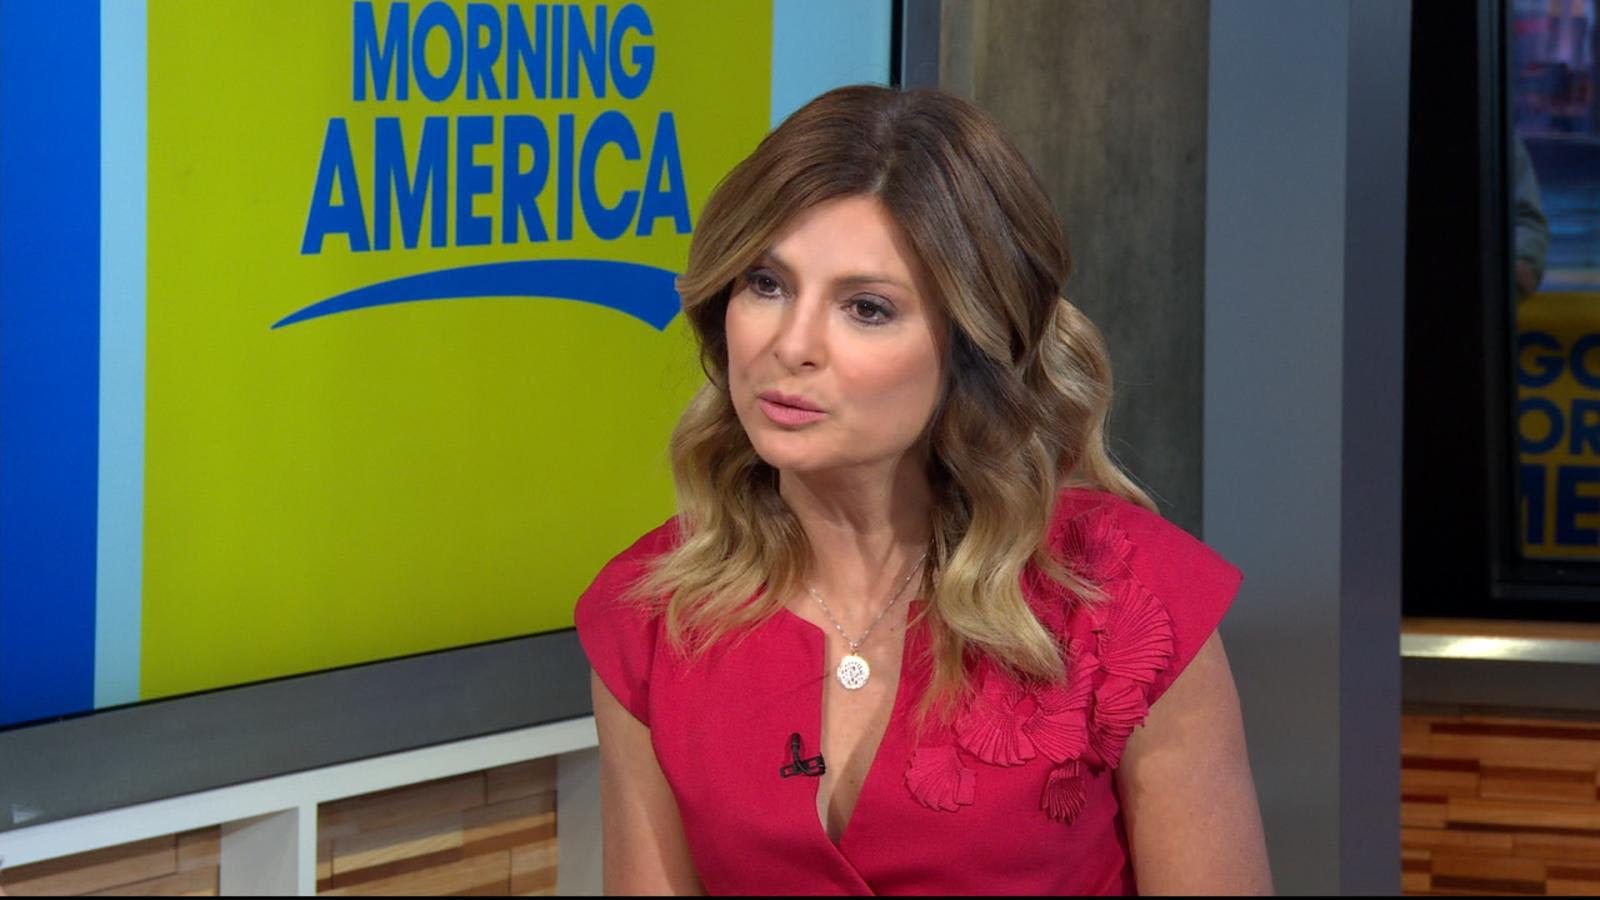 Good Morning America Latest News : Good morning america videos and latest news abc